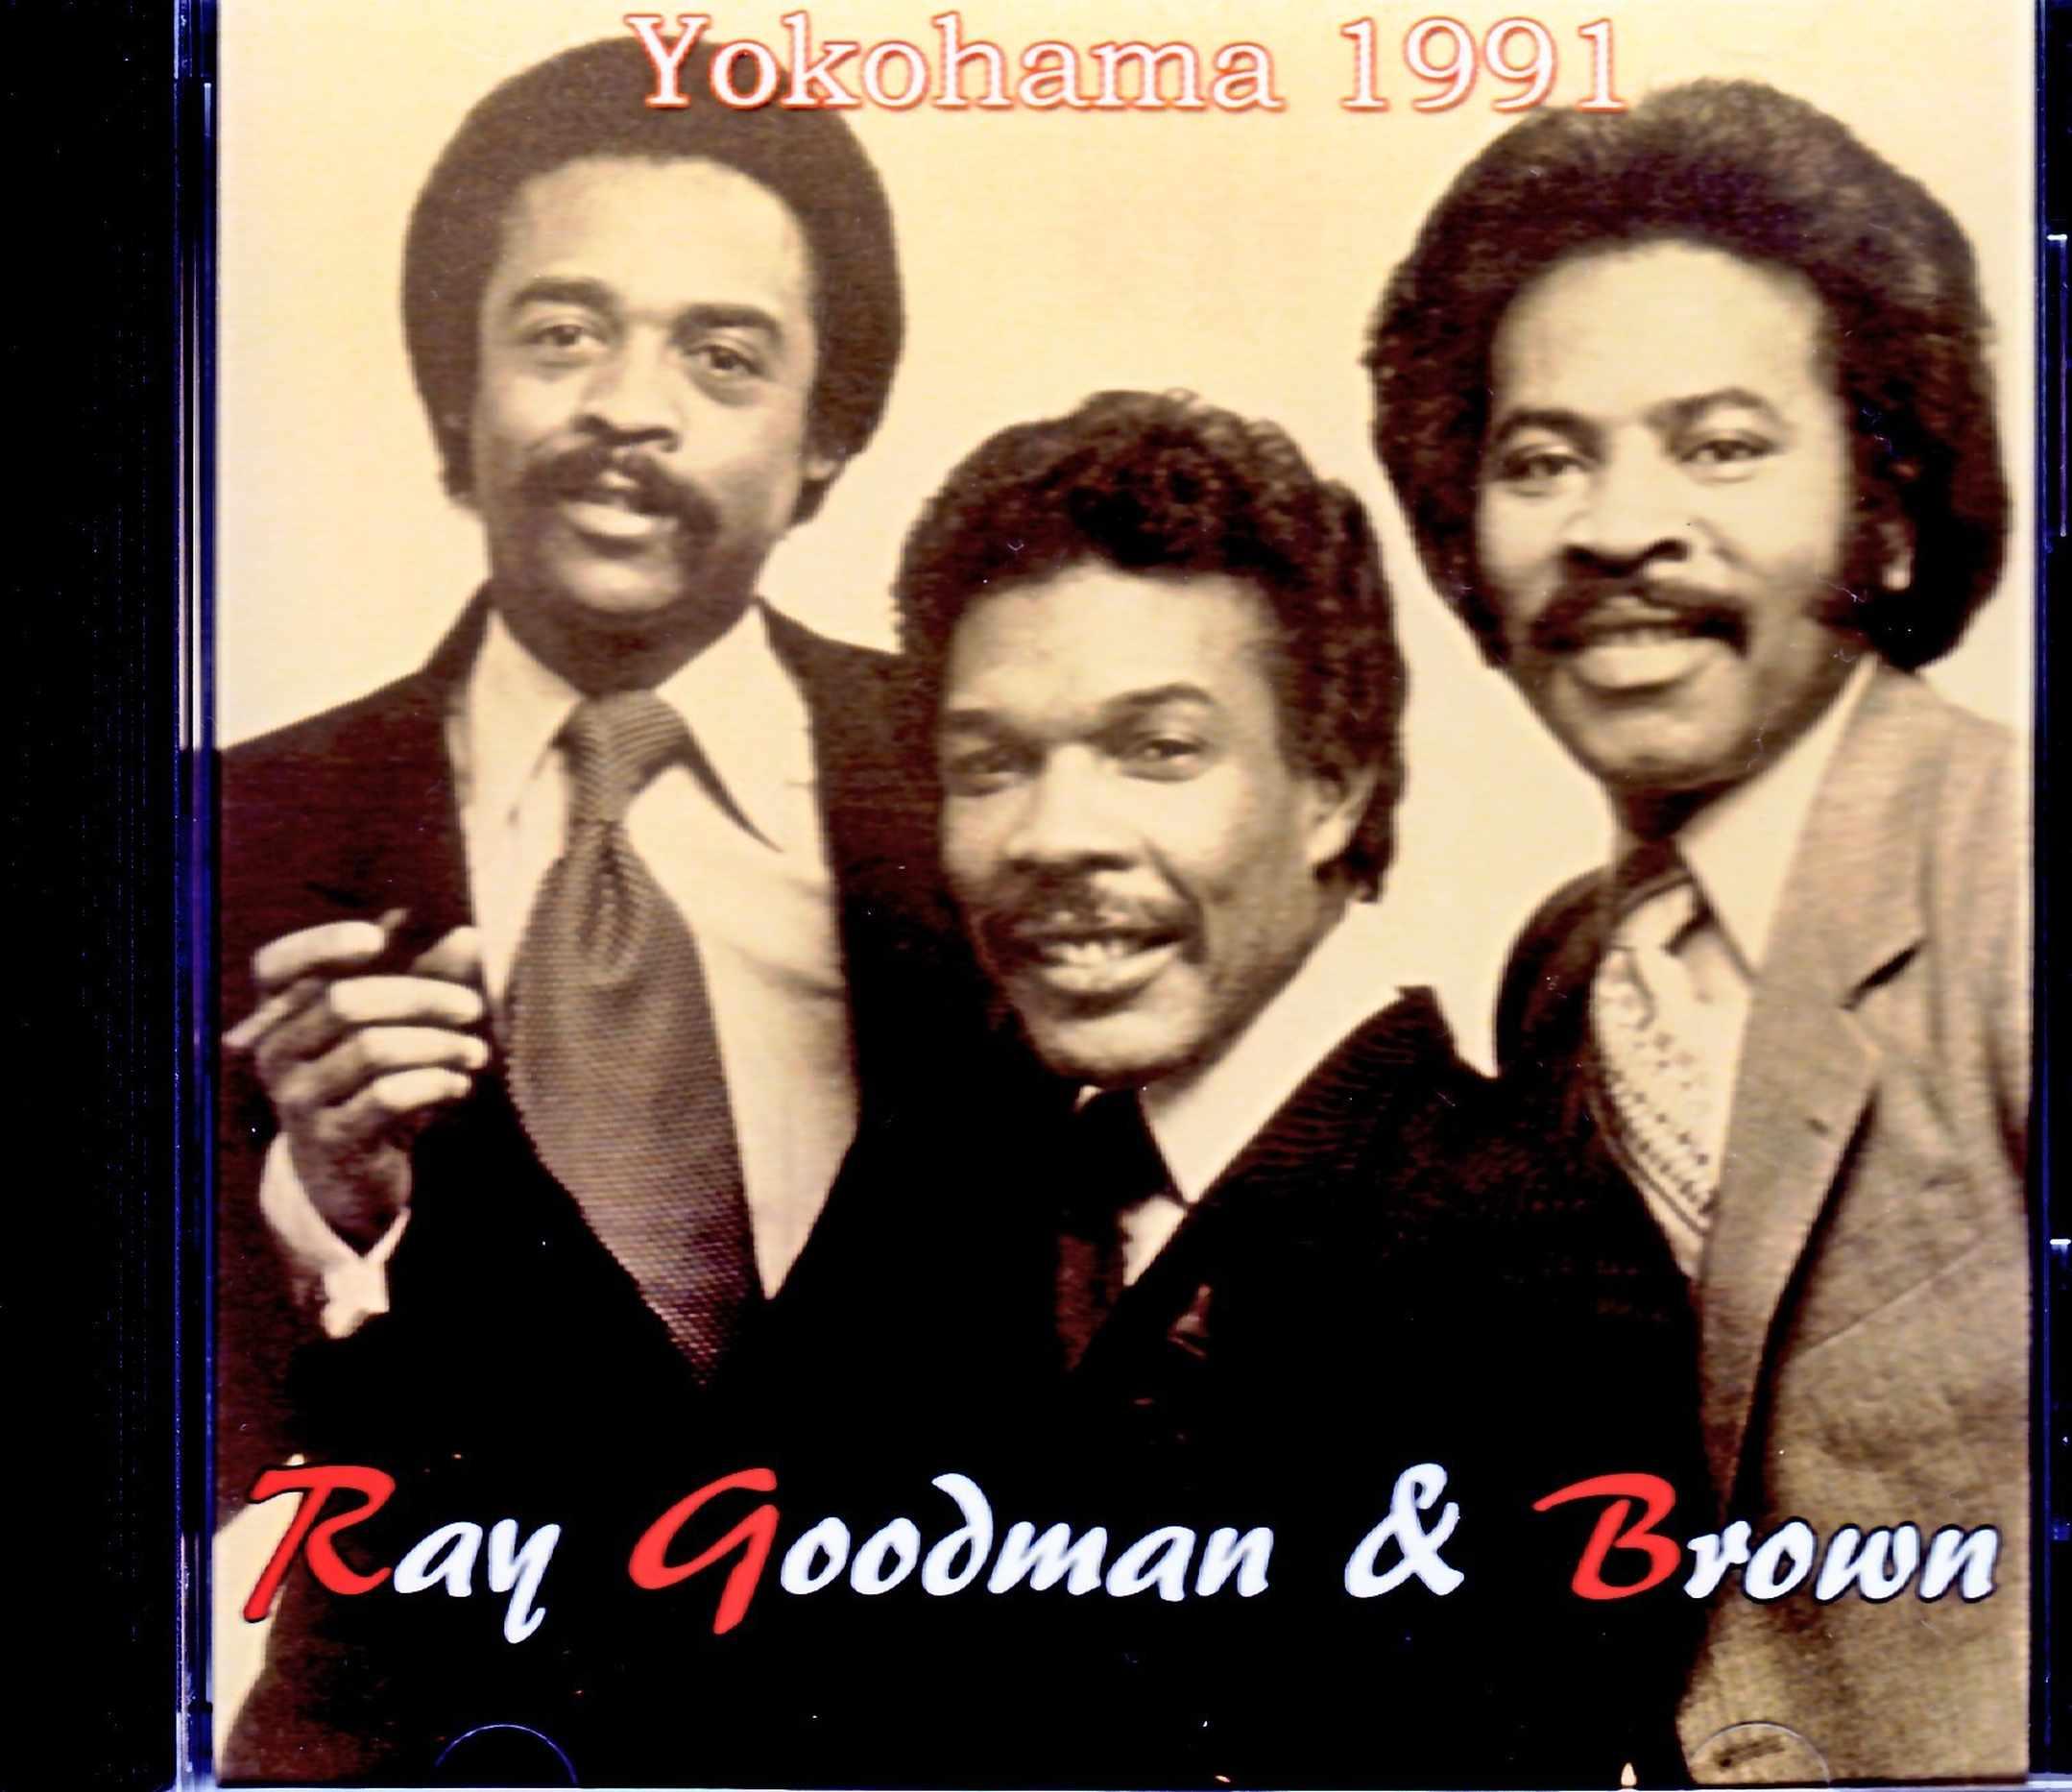 Ray Goodman & Brown レイ・グッドマン・アンド・ブラウン/Kanagawa,Japan 1991